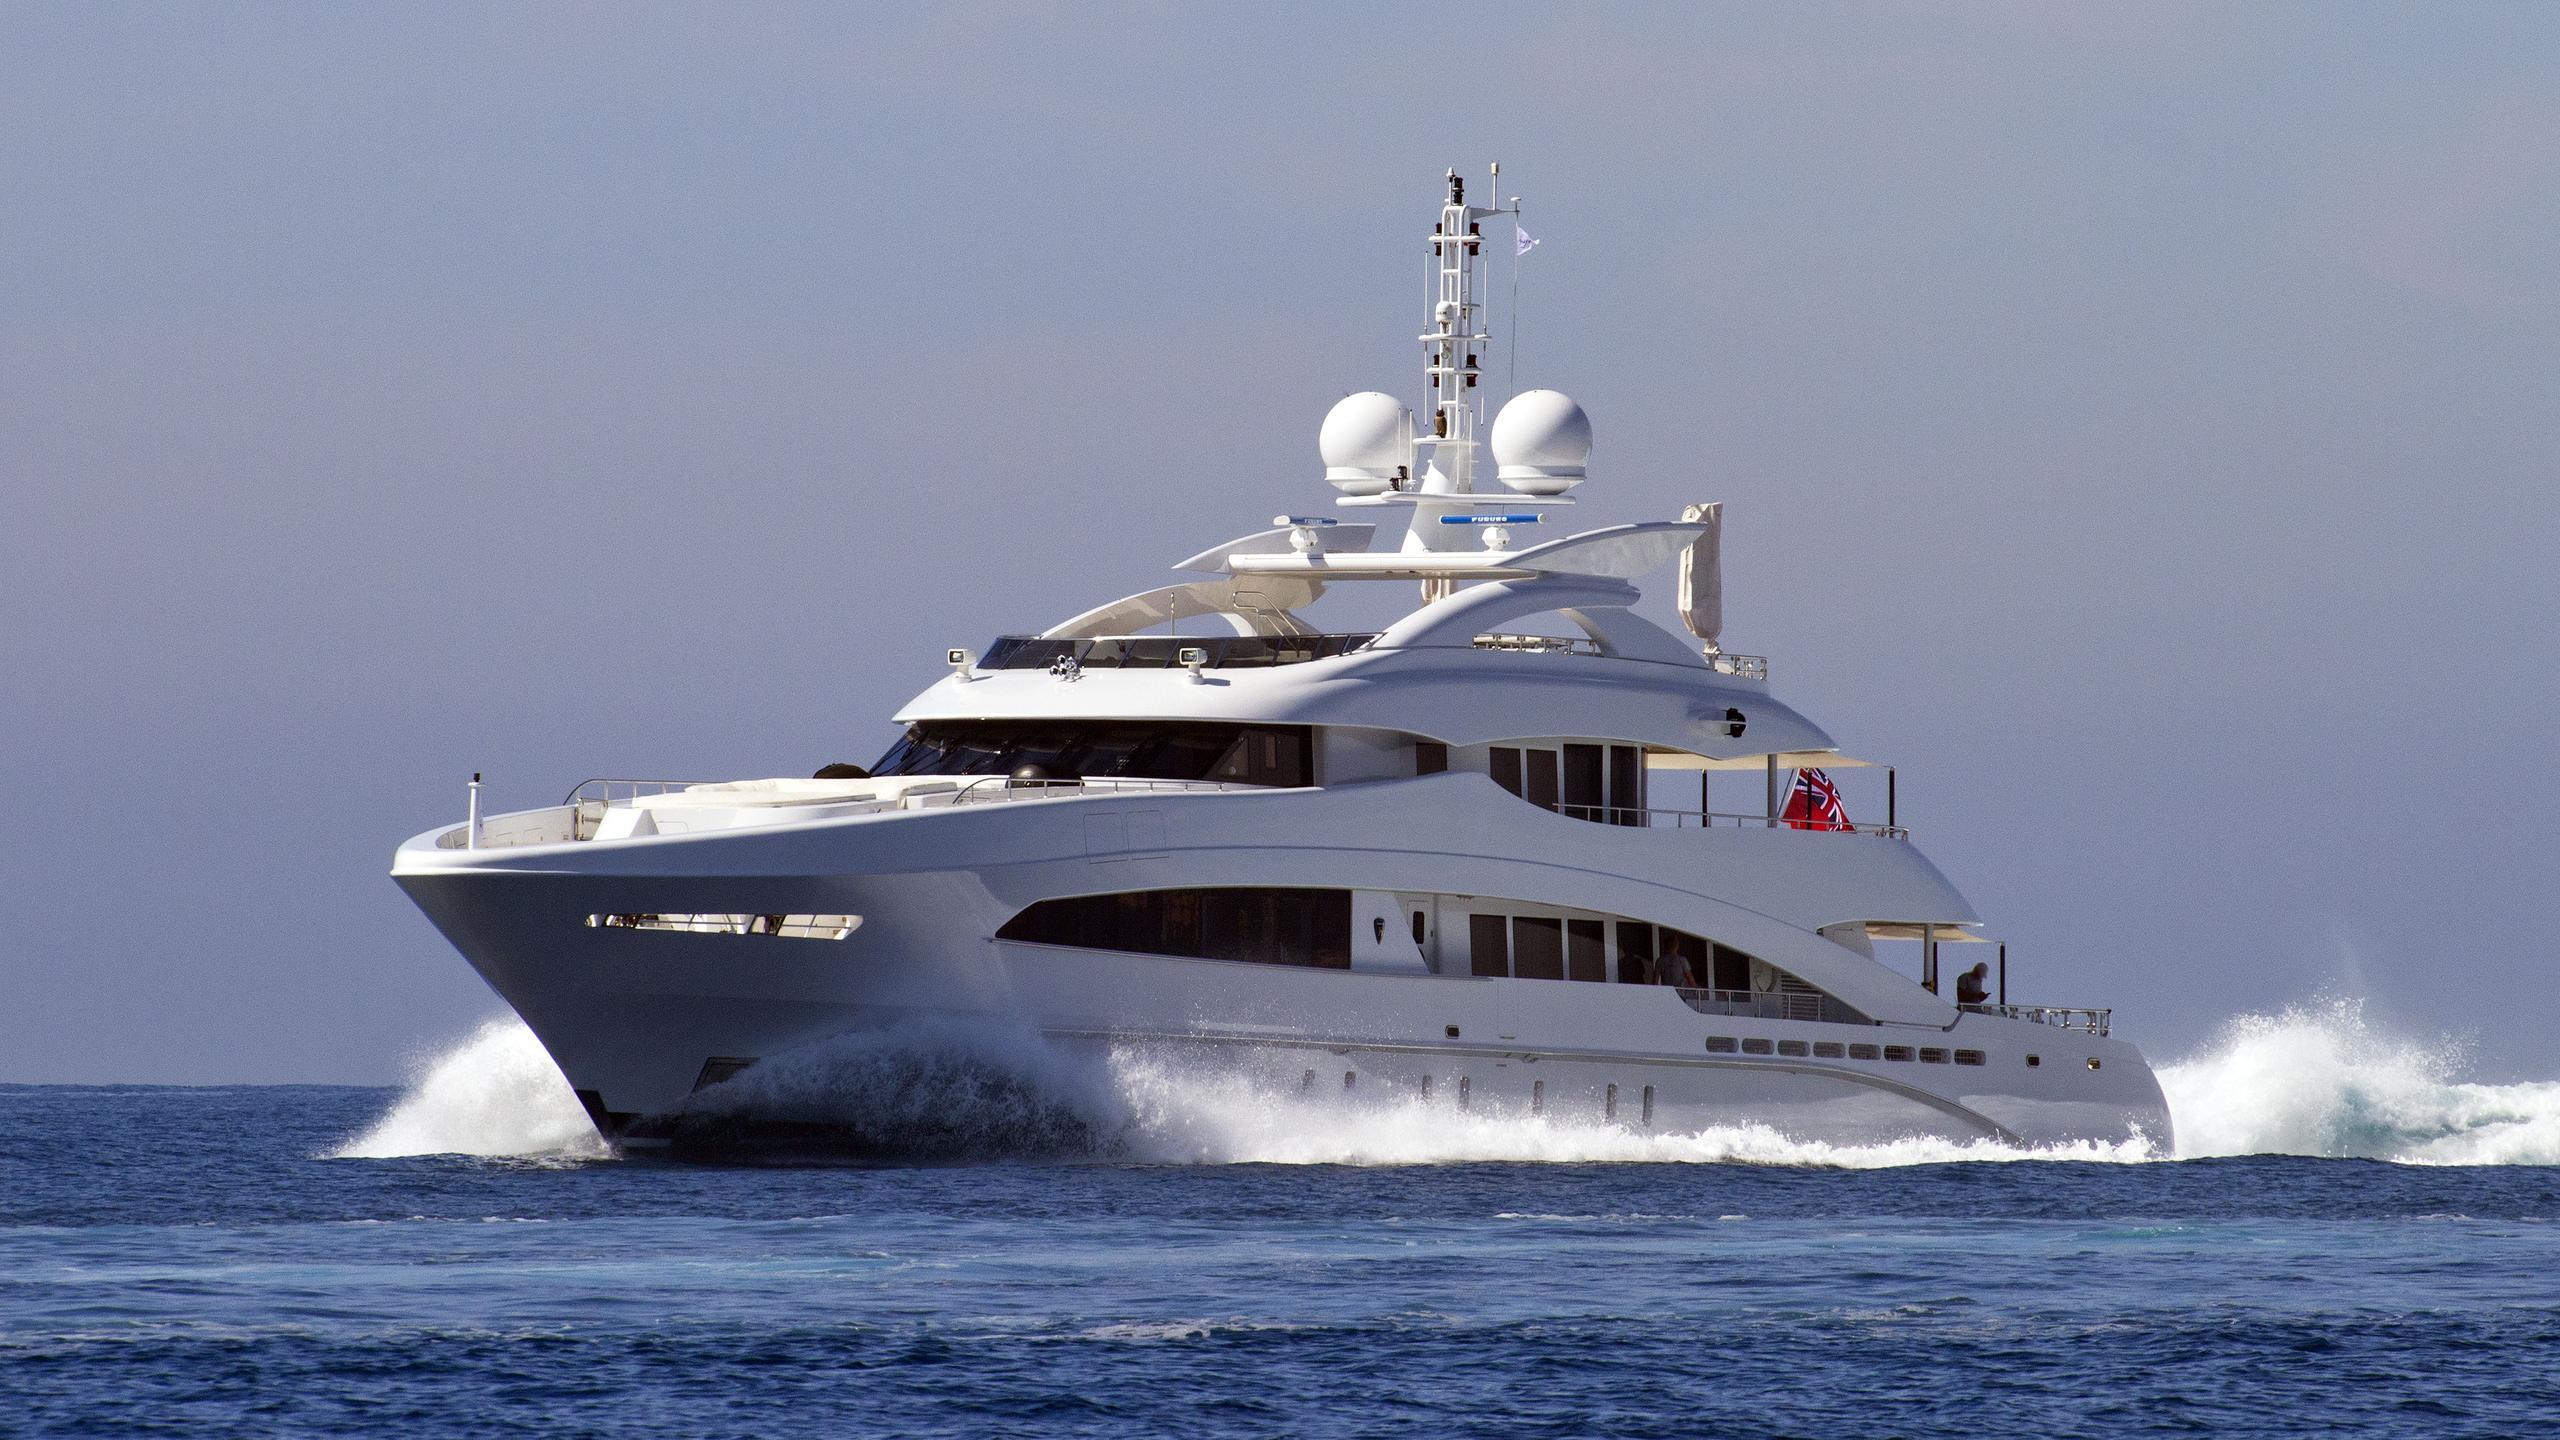 hayken-motor-yacht-heesen-2014-50m-cruising-half-profile